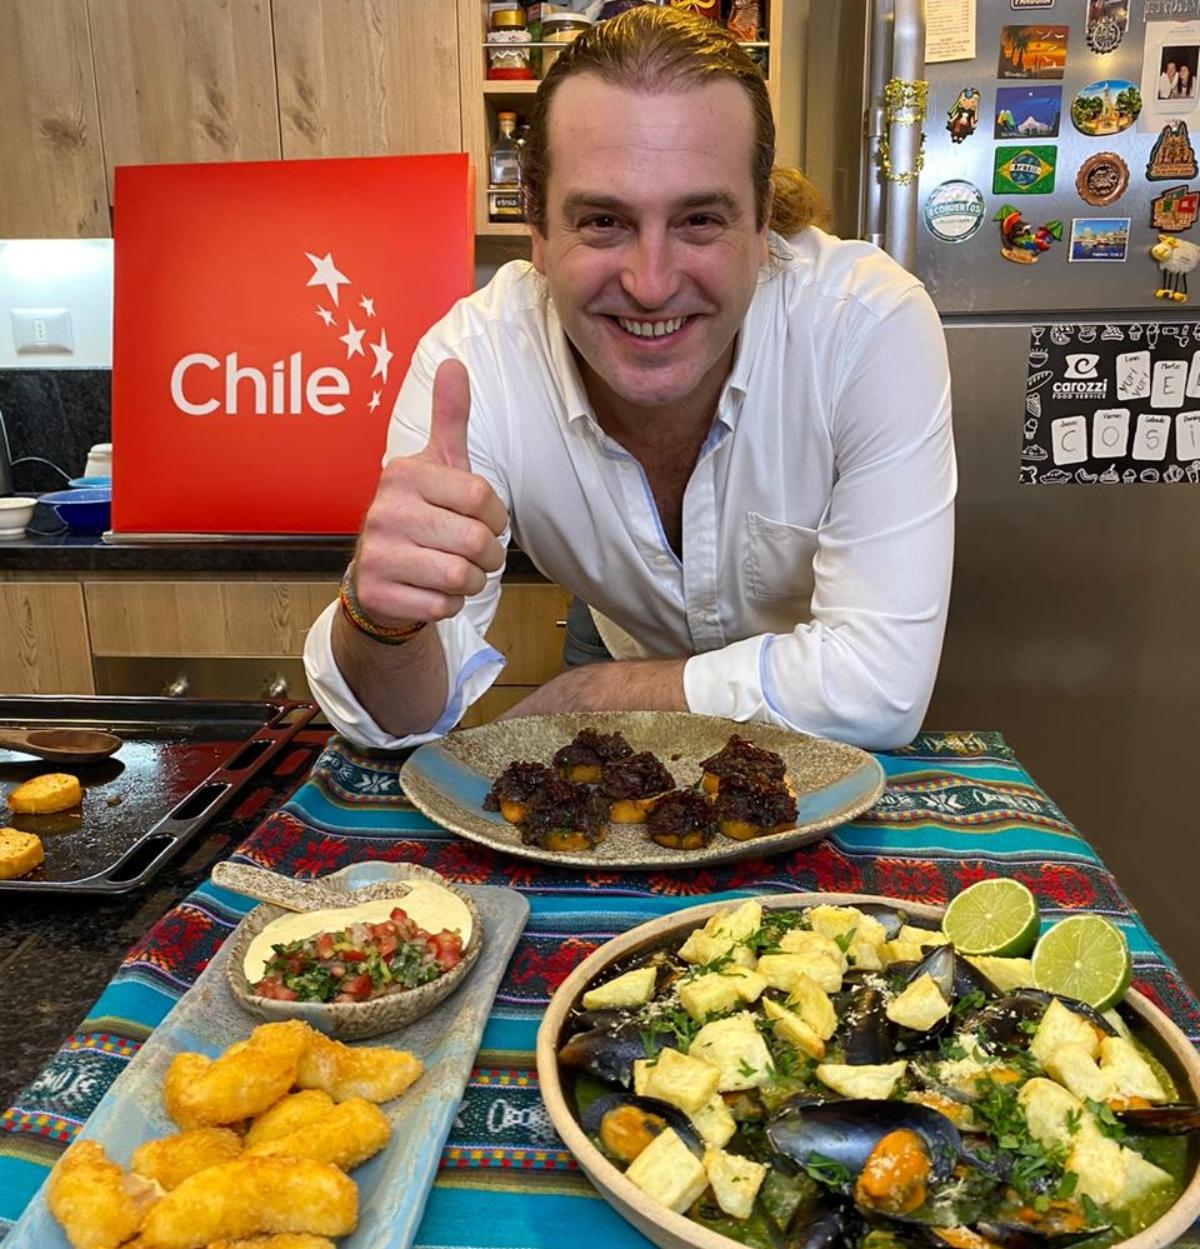 Imagen del chef chileno Mikel Zulueta